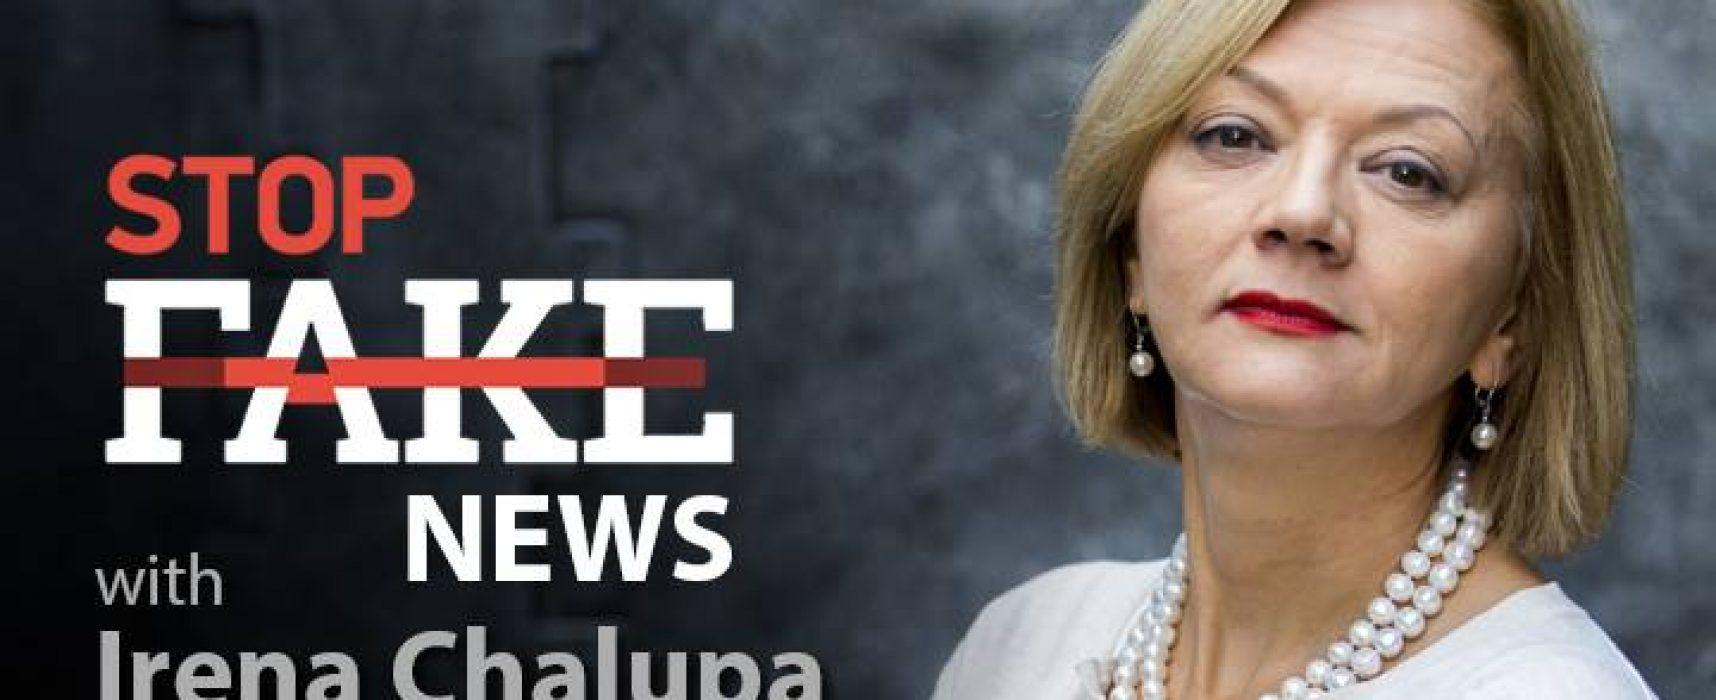 StopFakeNews #87 with Irena Chalupa